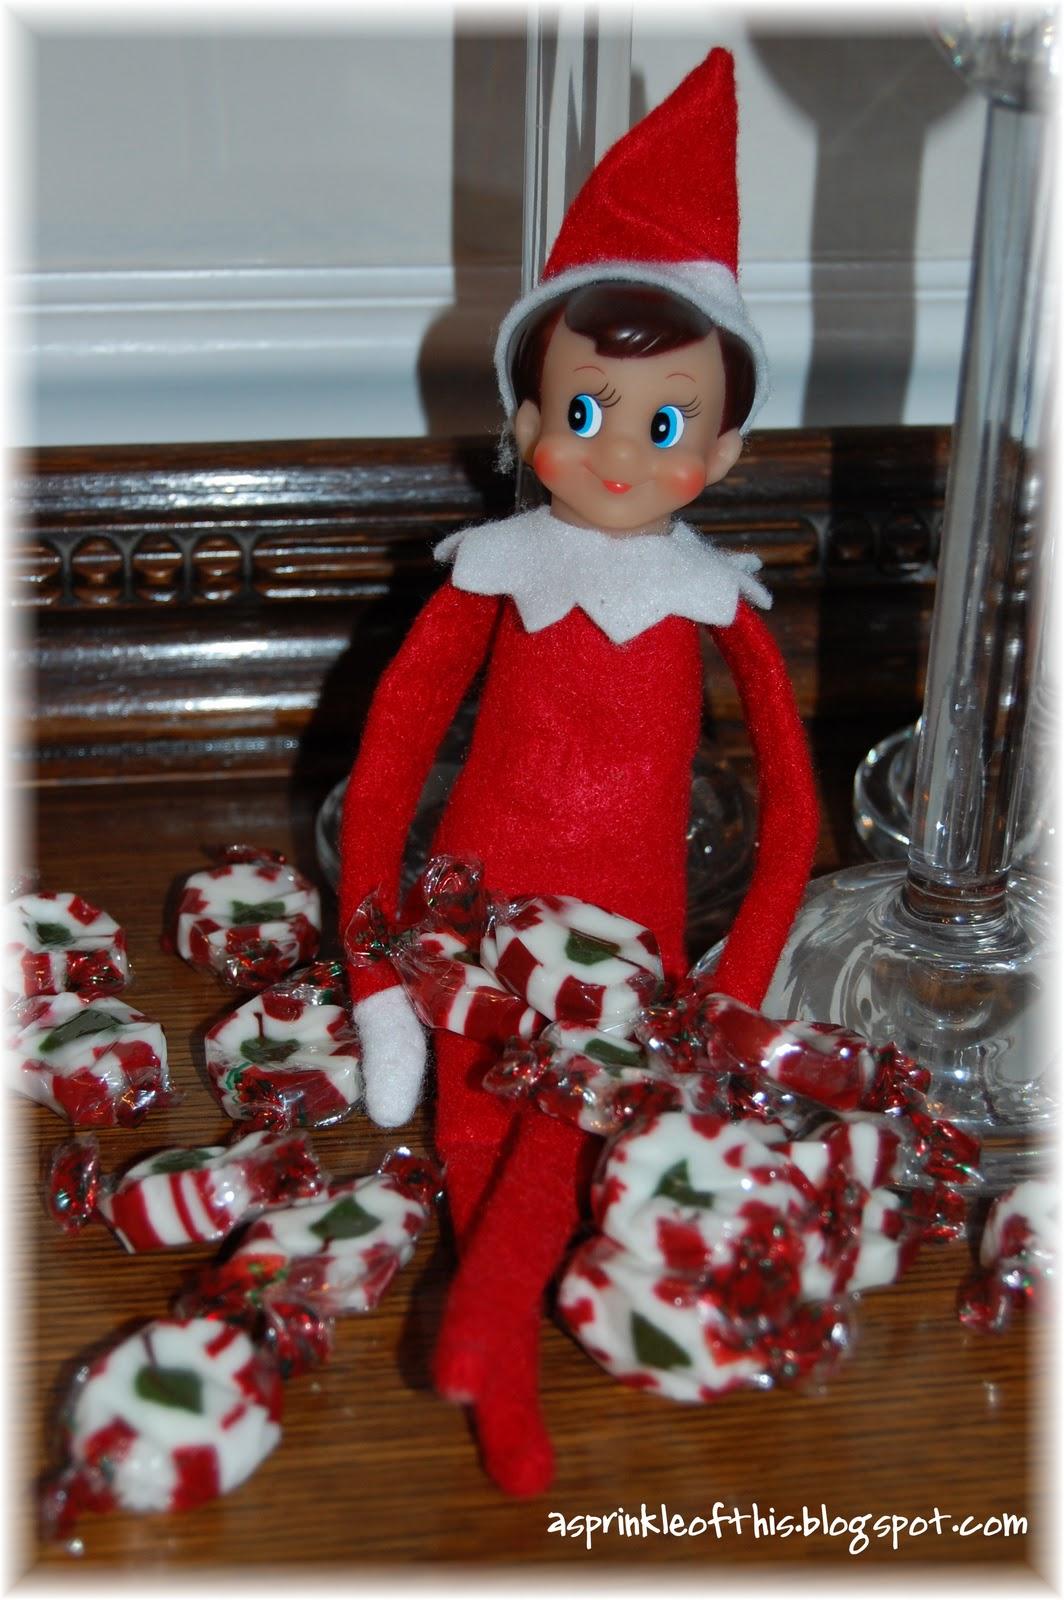 Hershey kisses jingles just b cause for Elf on the shelf chocolate kiss